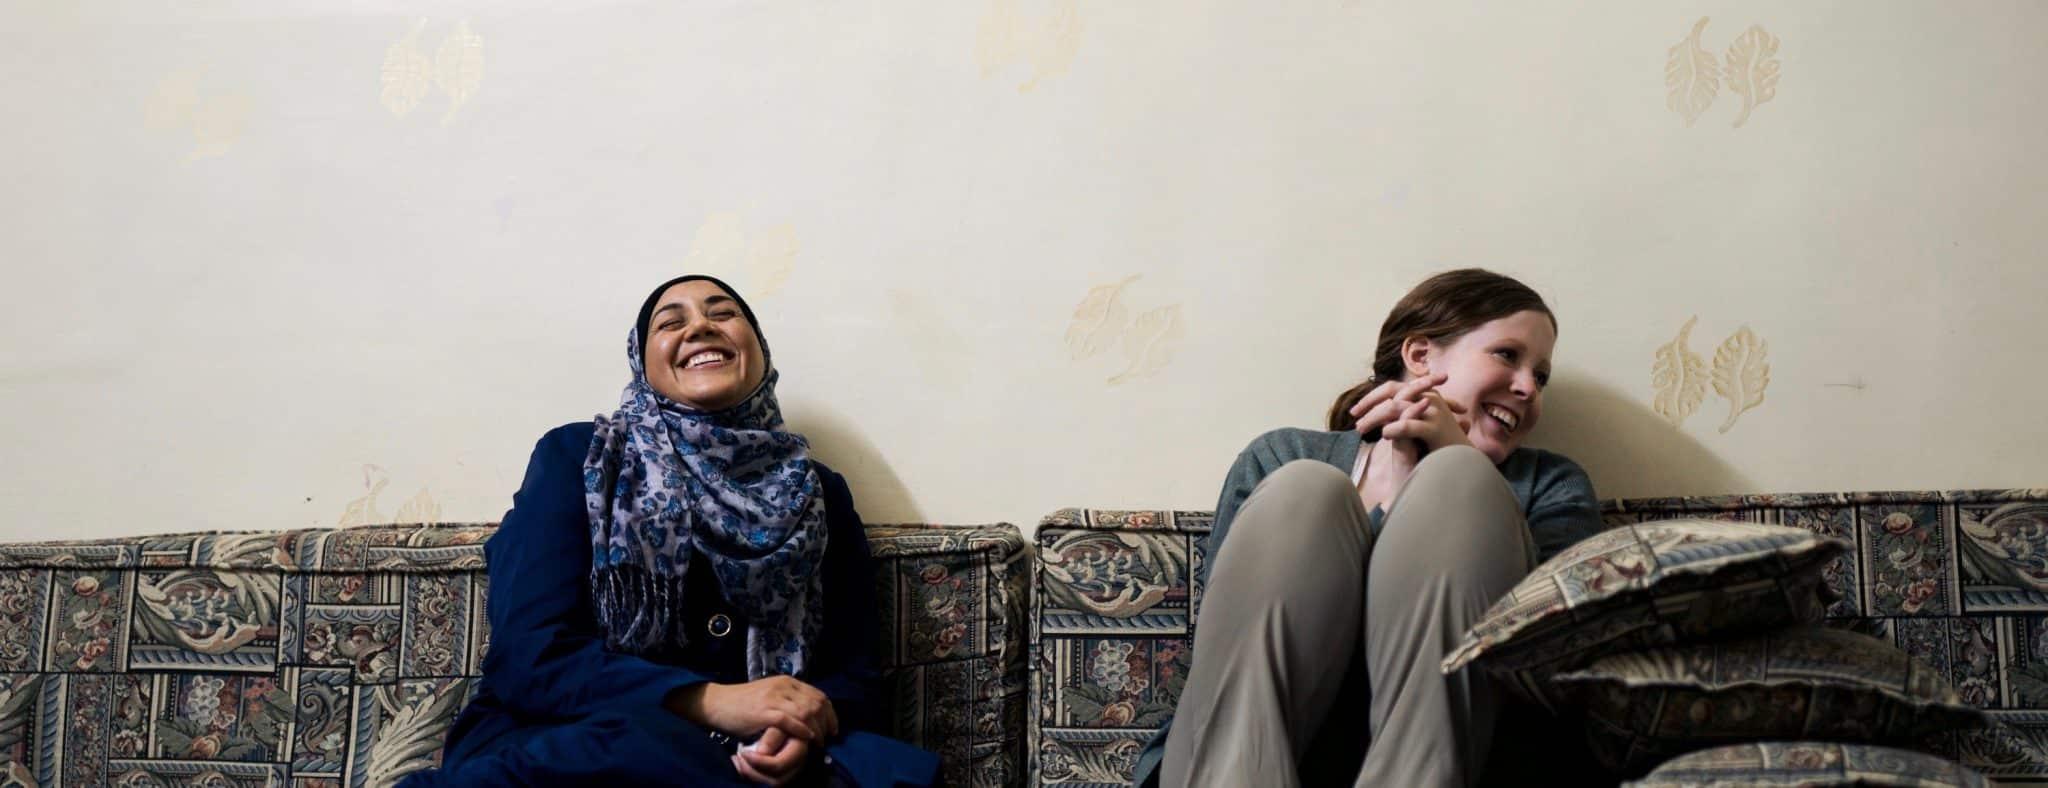 jordan-meeting-the-locals-engaging-cultures